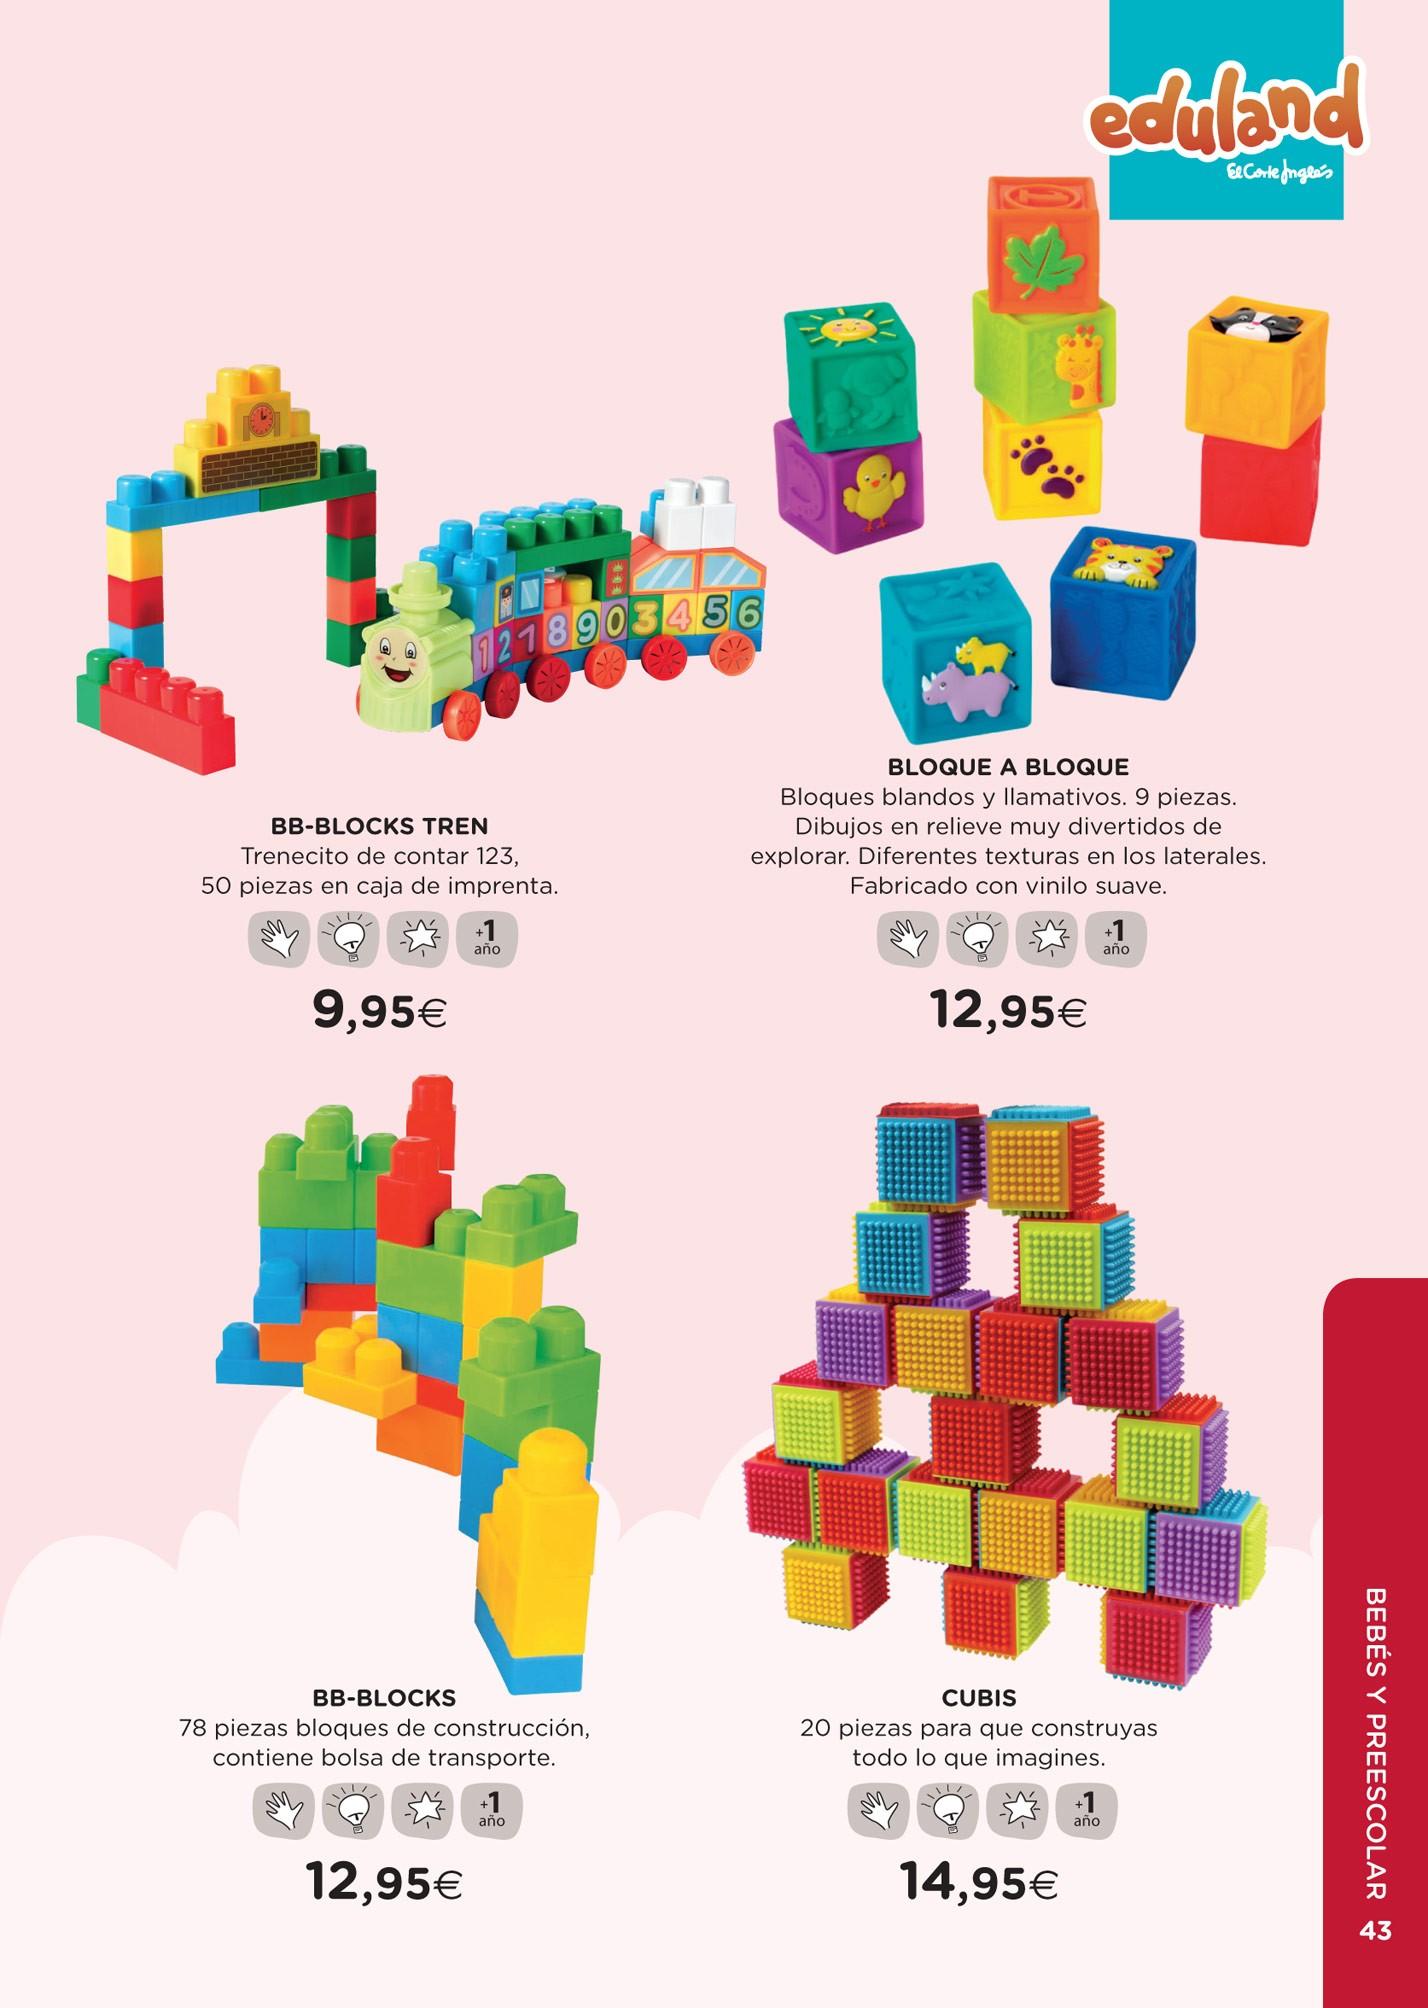 Calendario 2019 Con Festivos Valencia Más Actual Catálogos Juguetes · El Corte Inglés Of Calendario 2019 Con Festivos Valencia Más Recientemente Liberado Calaméo Gara